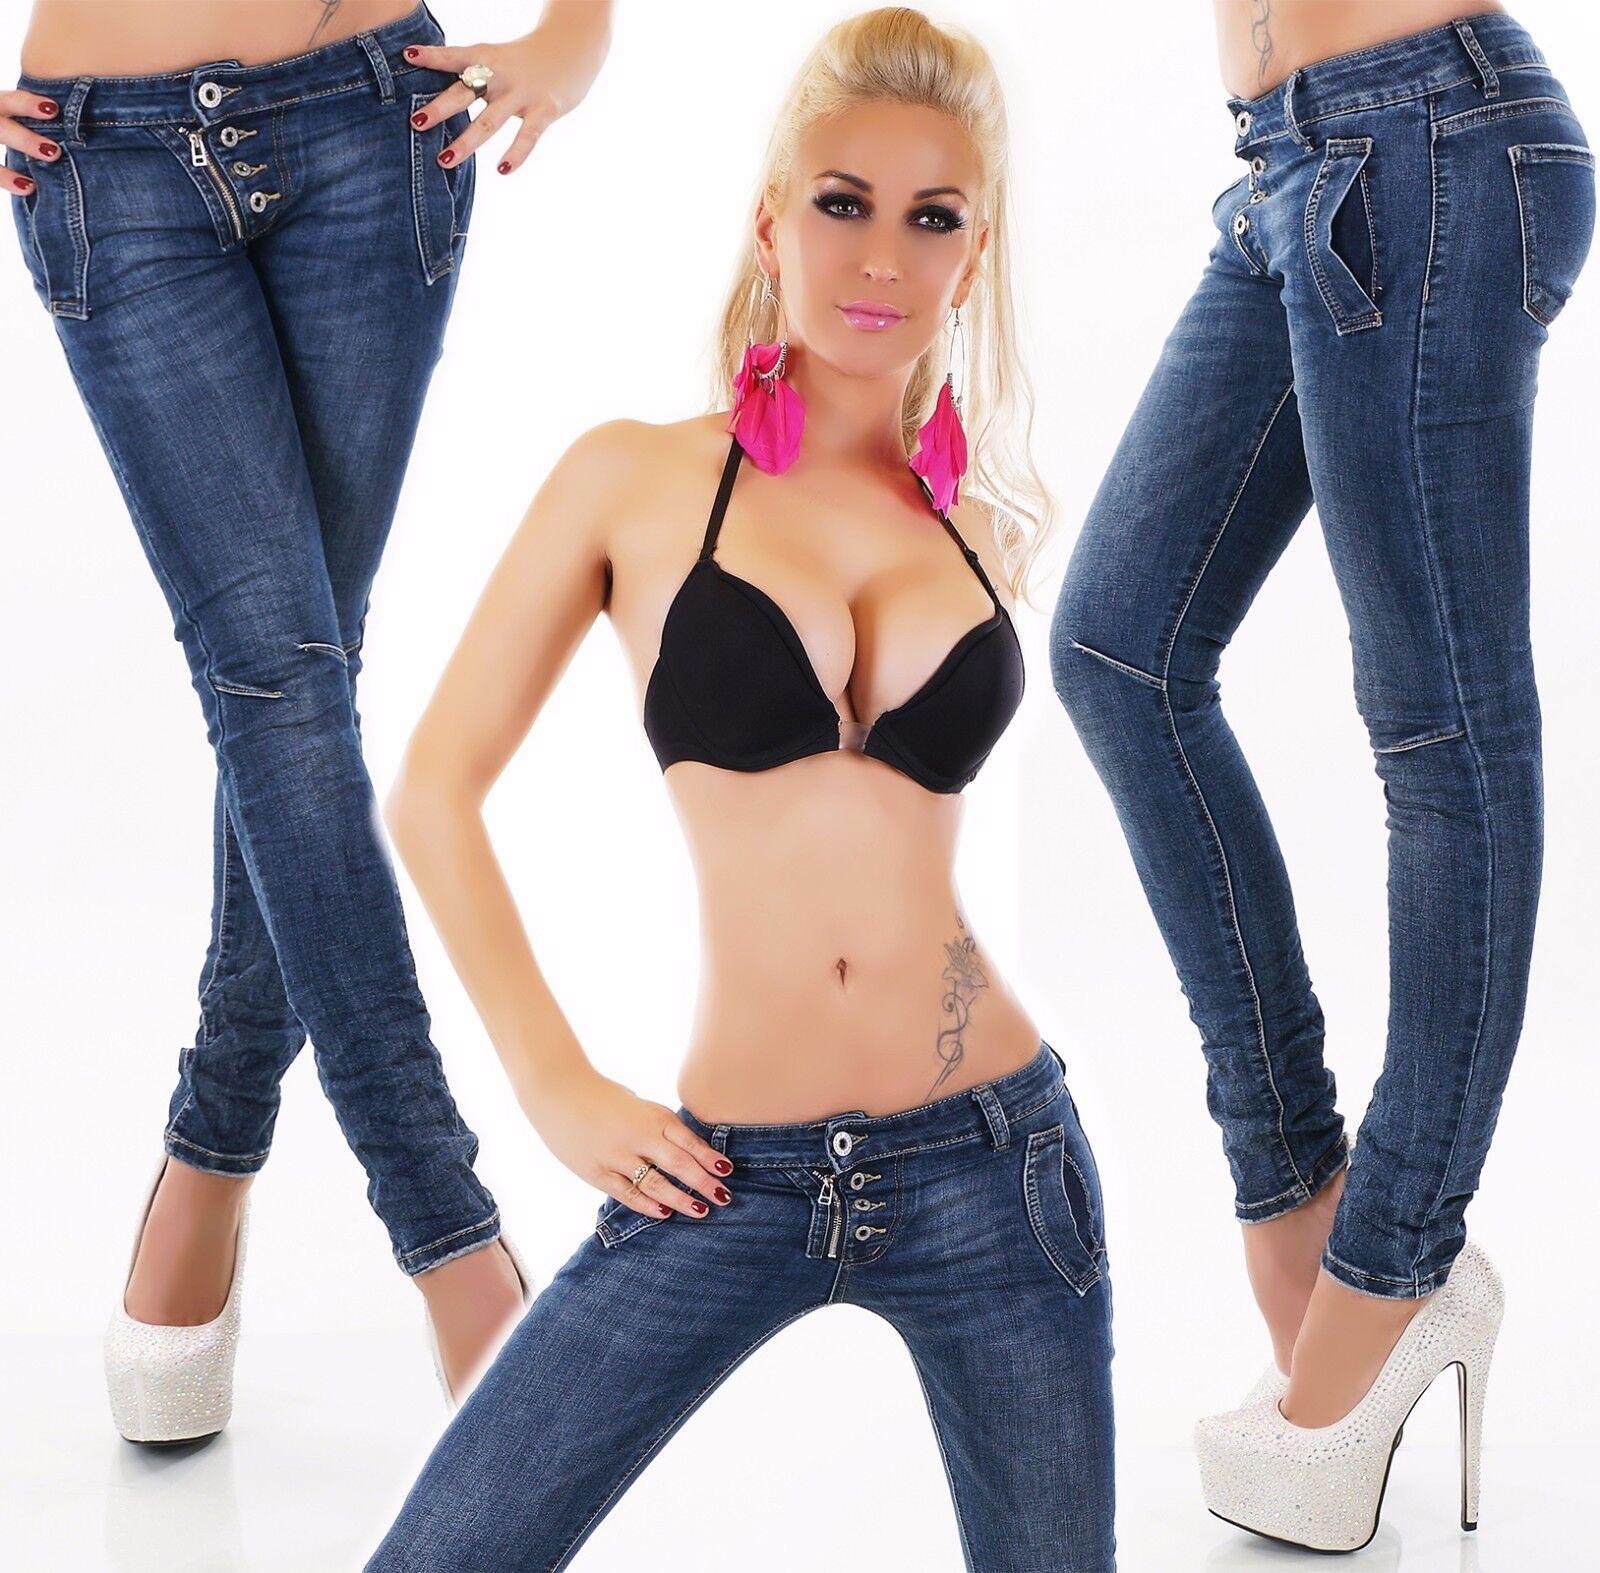 Donna Donna Donna Baggy Jeans Pantaloni Jeans Skinny Denim Impatto Look con Bottoni Zip c6074d